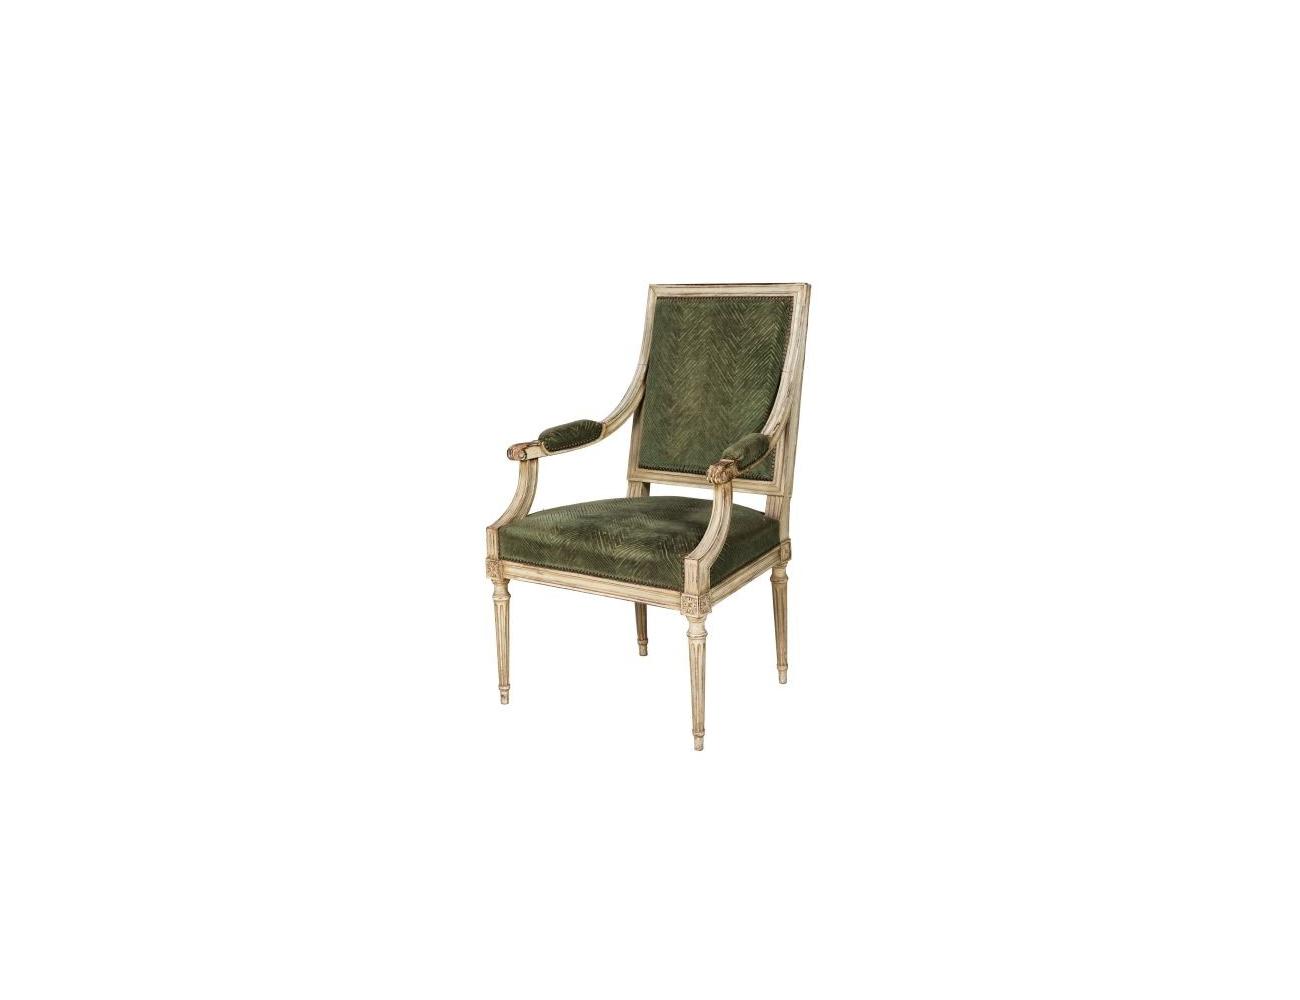 Silla estilo luis xvi beautiful pareja de sillones y seis for Sillas de estilo luis xvi